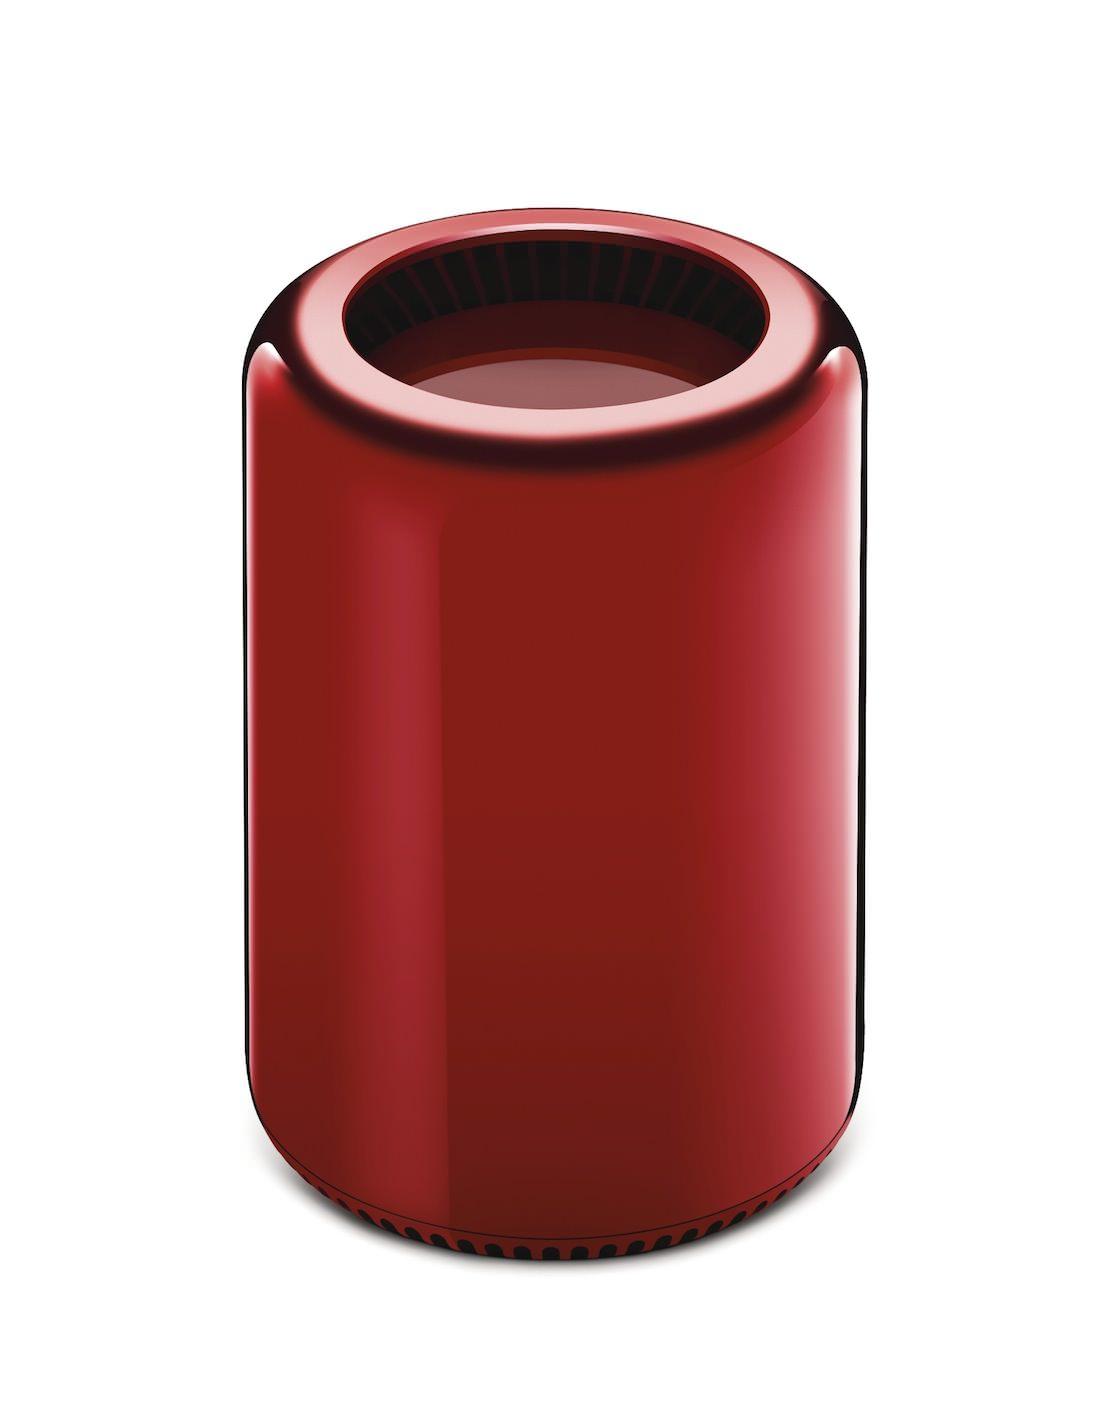 Mac Red Lipstick: Mac Pro Red, A World Record